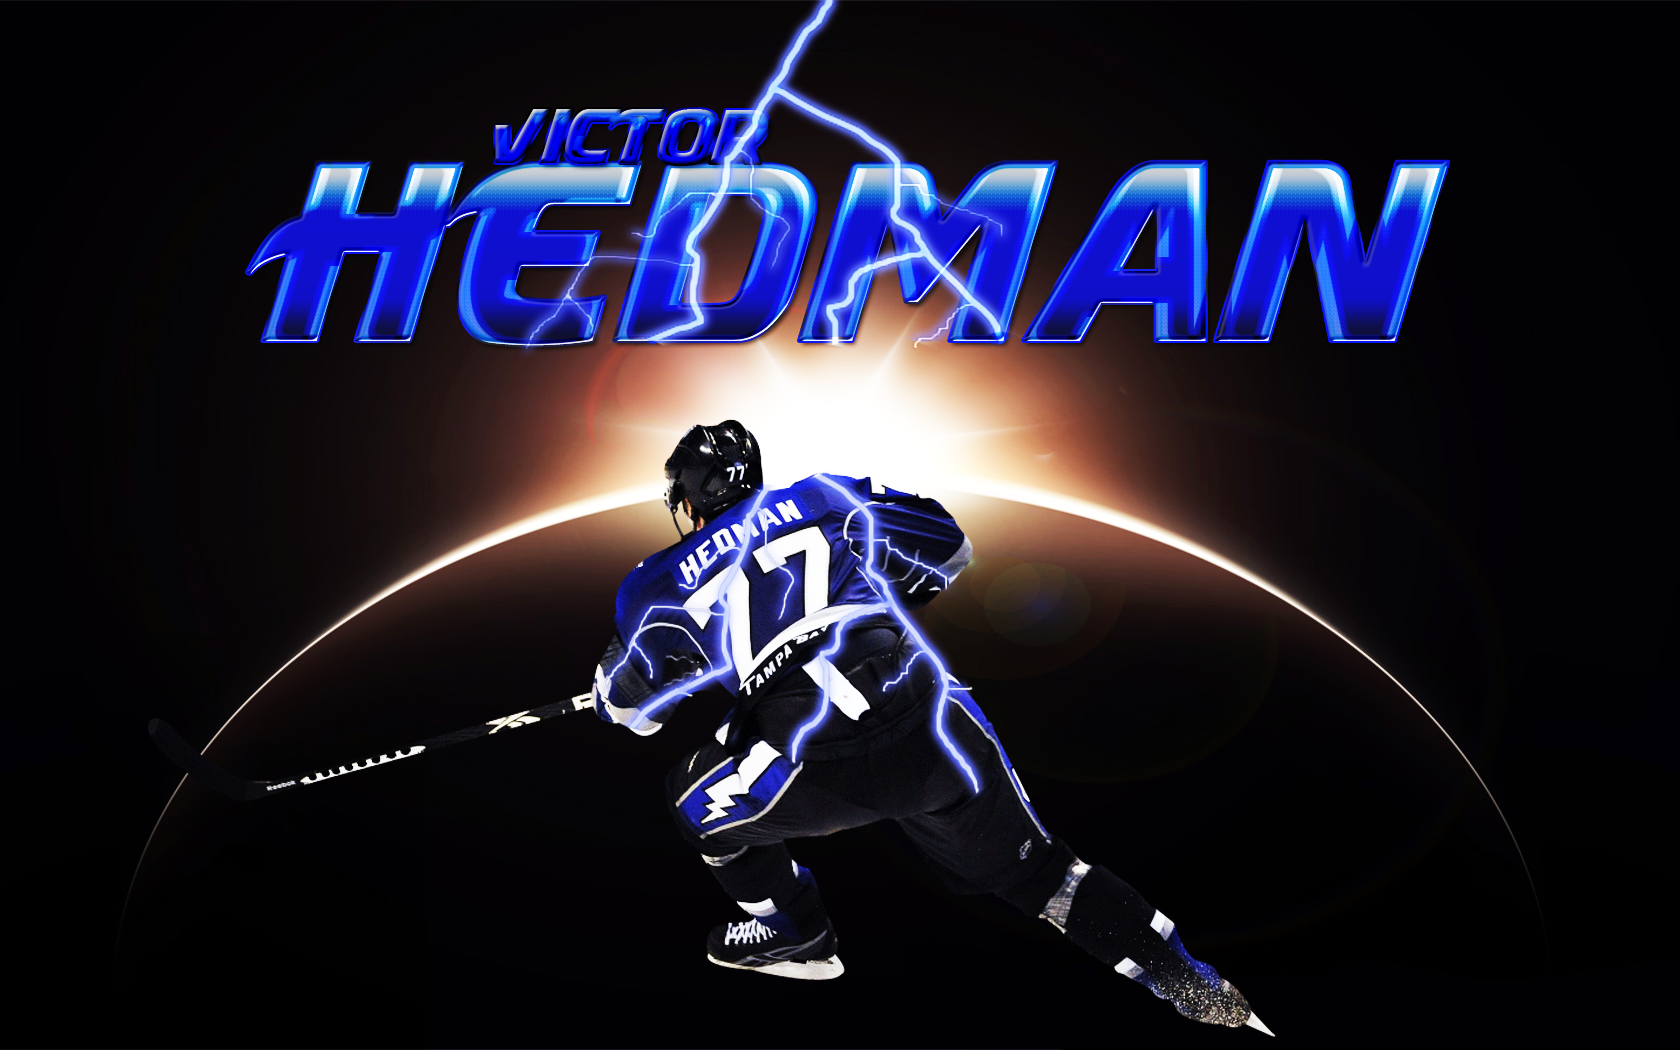 NHL Tampa Bay Lightning Victor Hedman wallpaper 2018 in Hockey 1680x1050